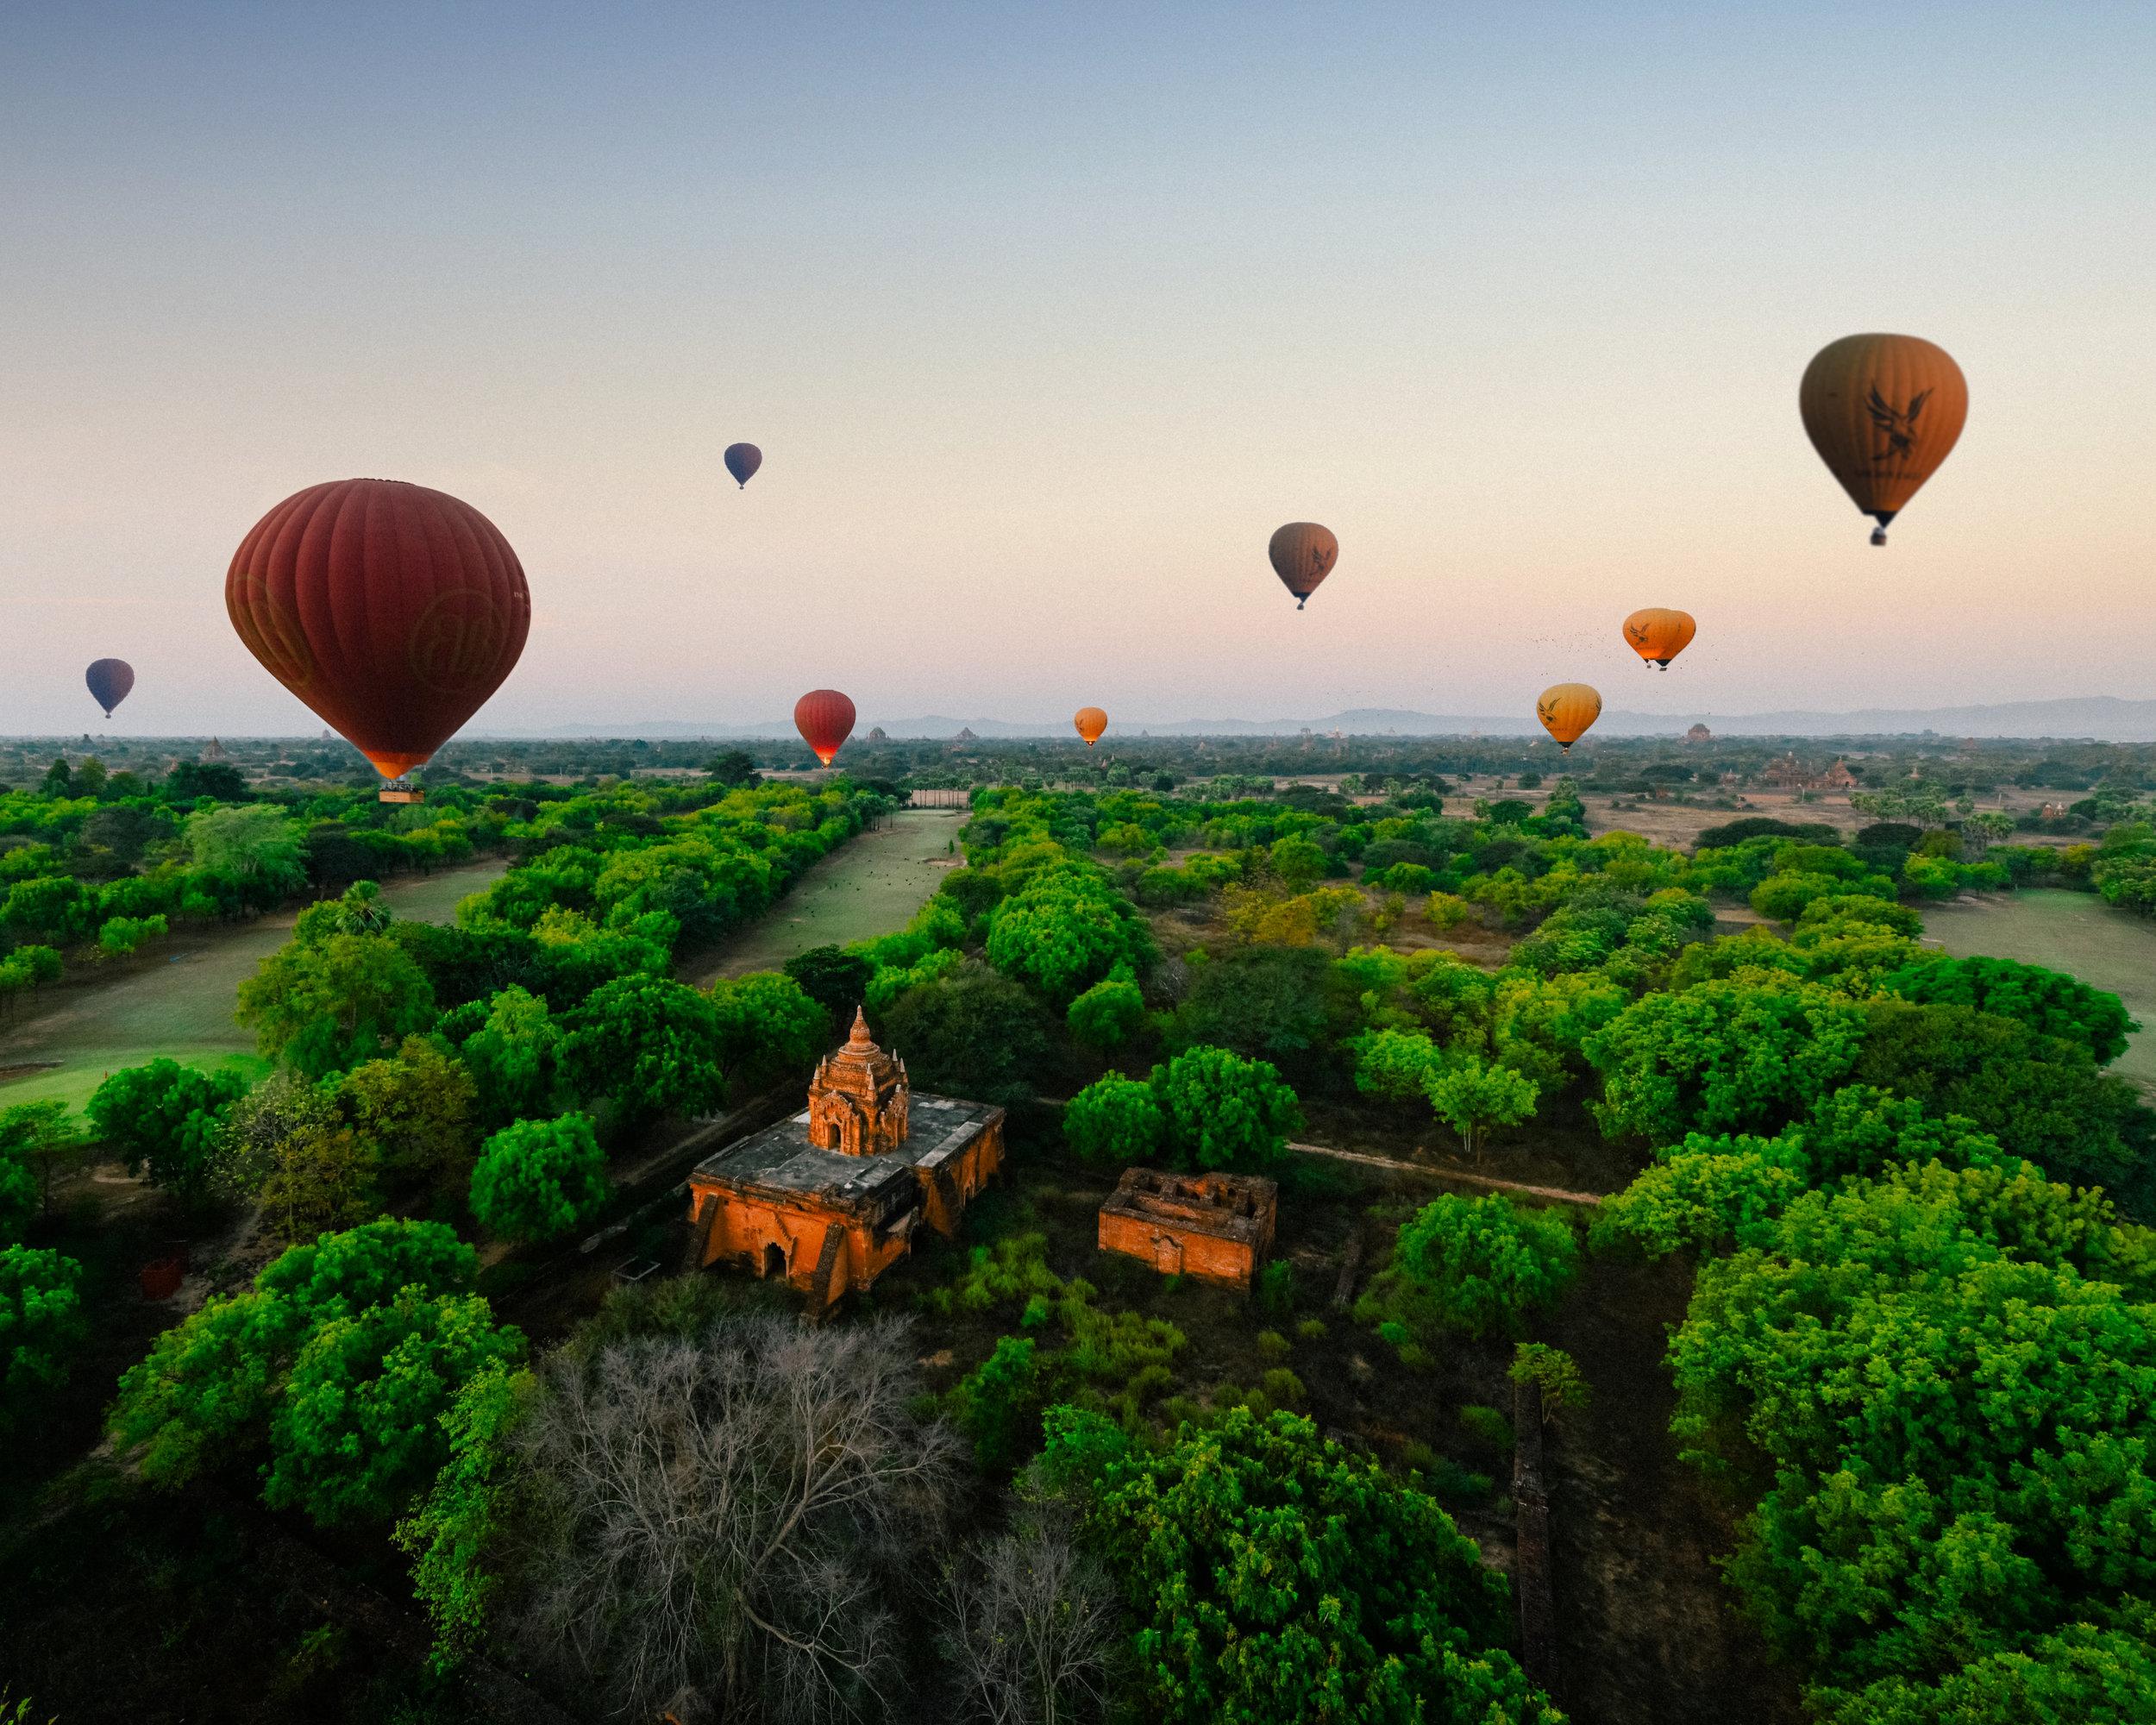 Myanmar - balloons in Bagan and a pagoda